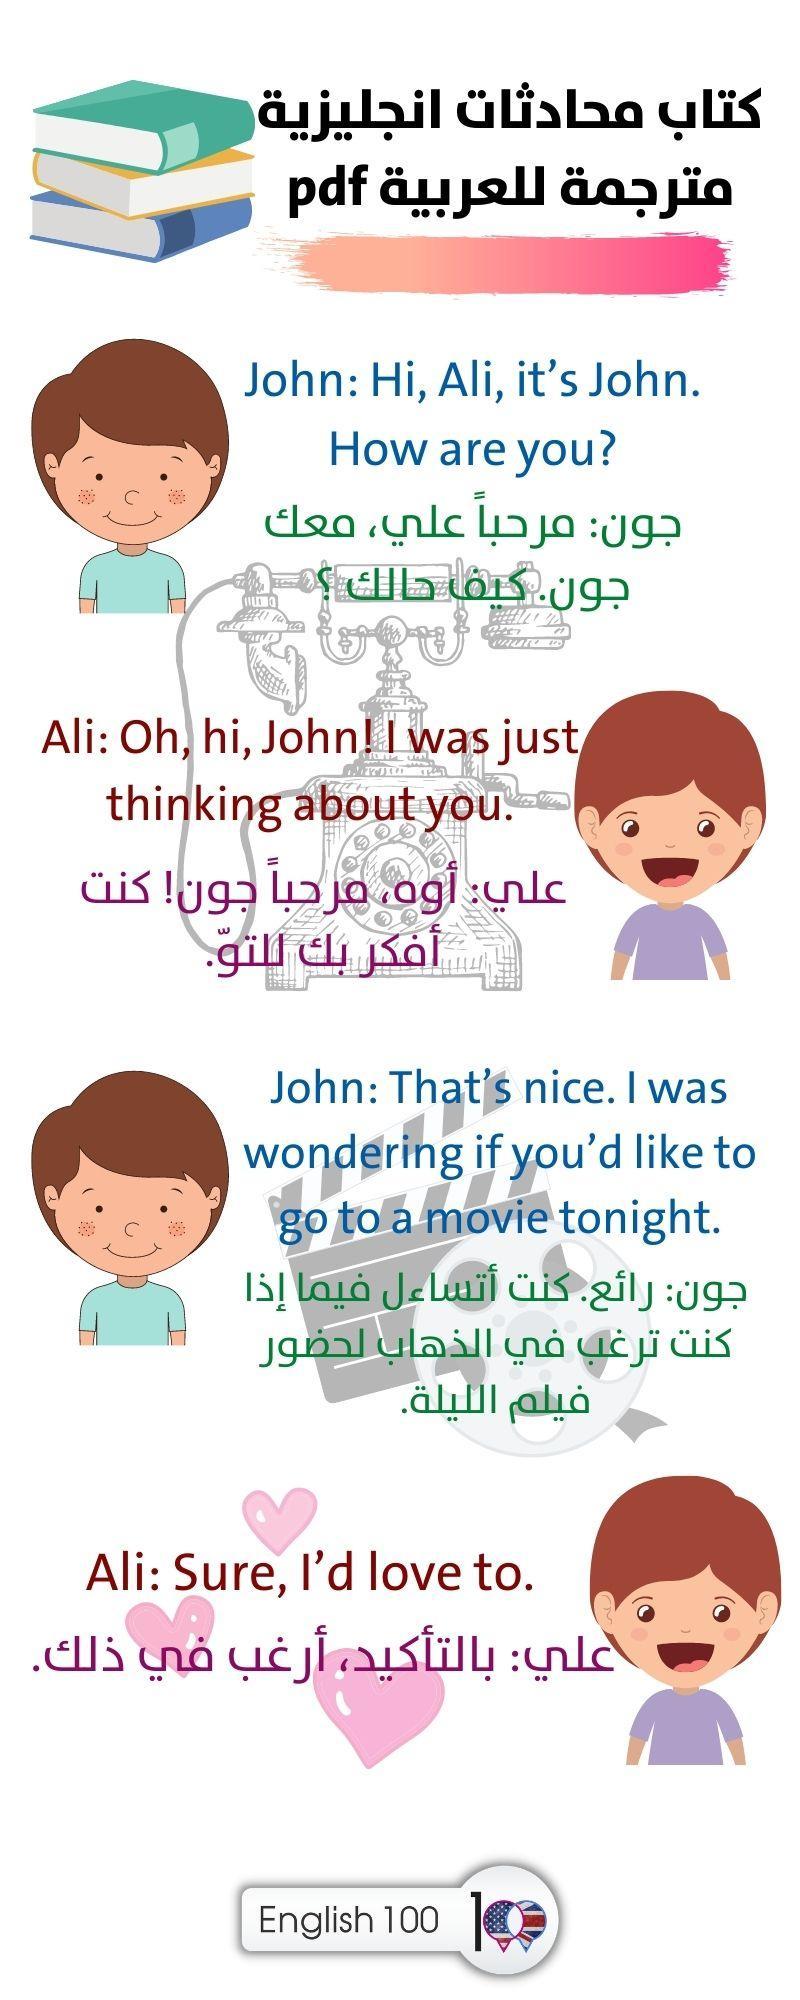 كتاب محادثات انجليزية مترجمة للعربية pdf English Conversations Book Translated into Arabic pdf